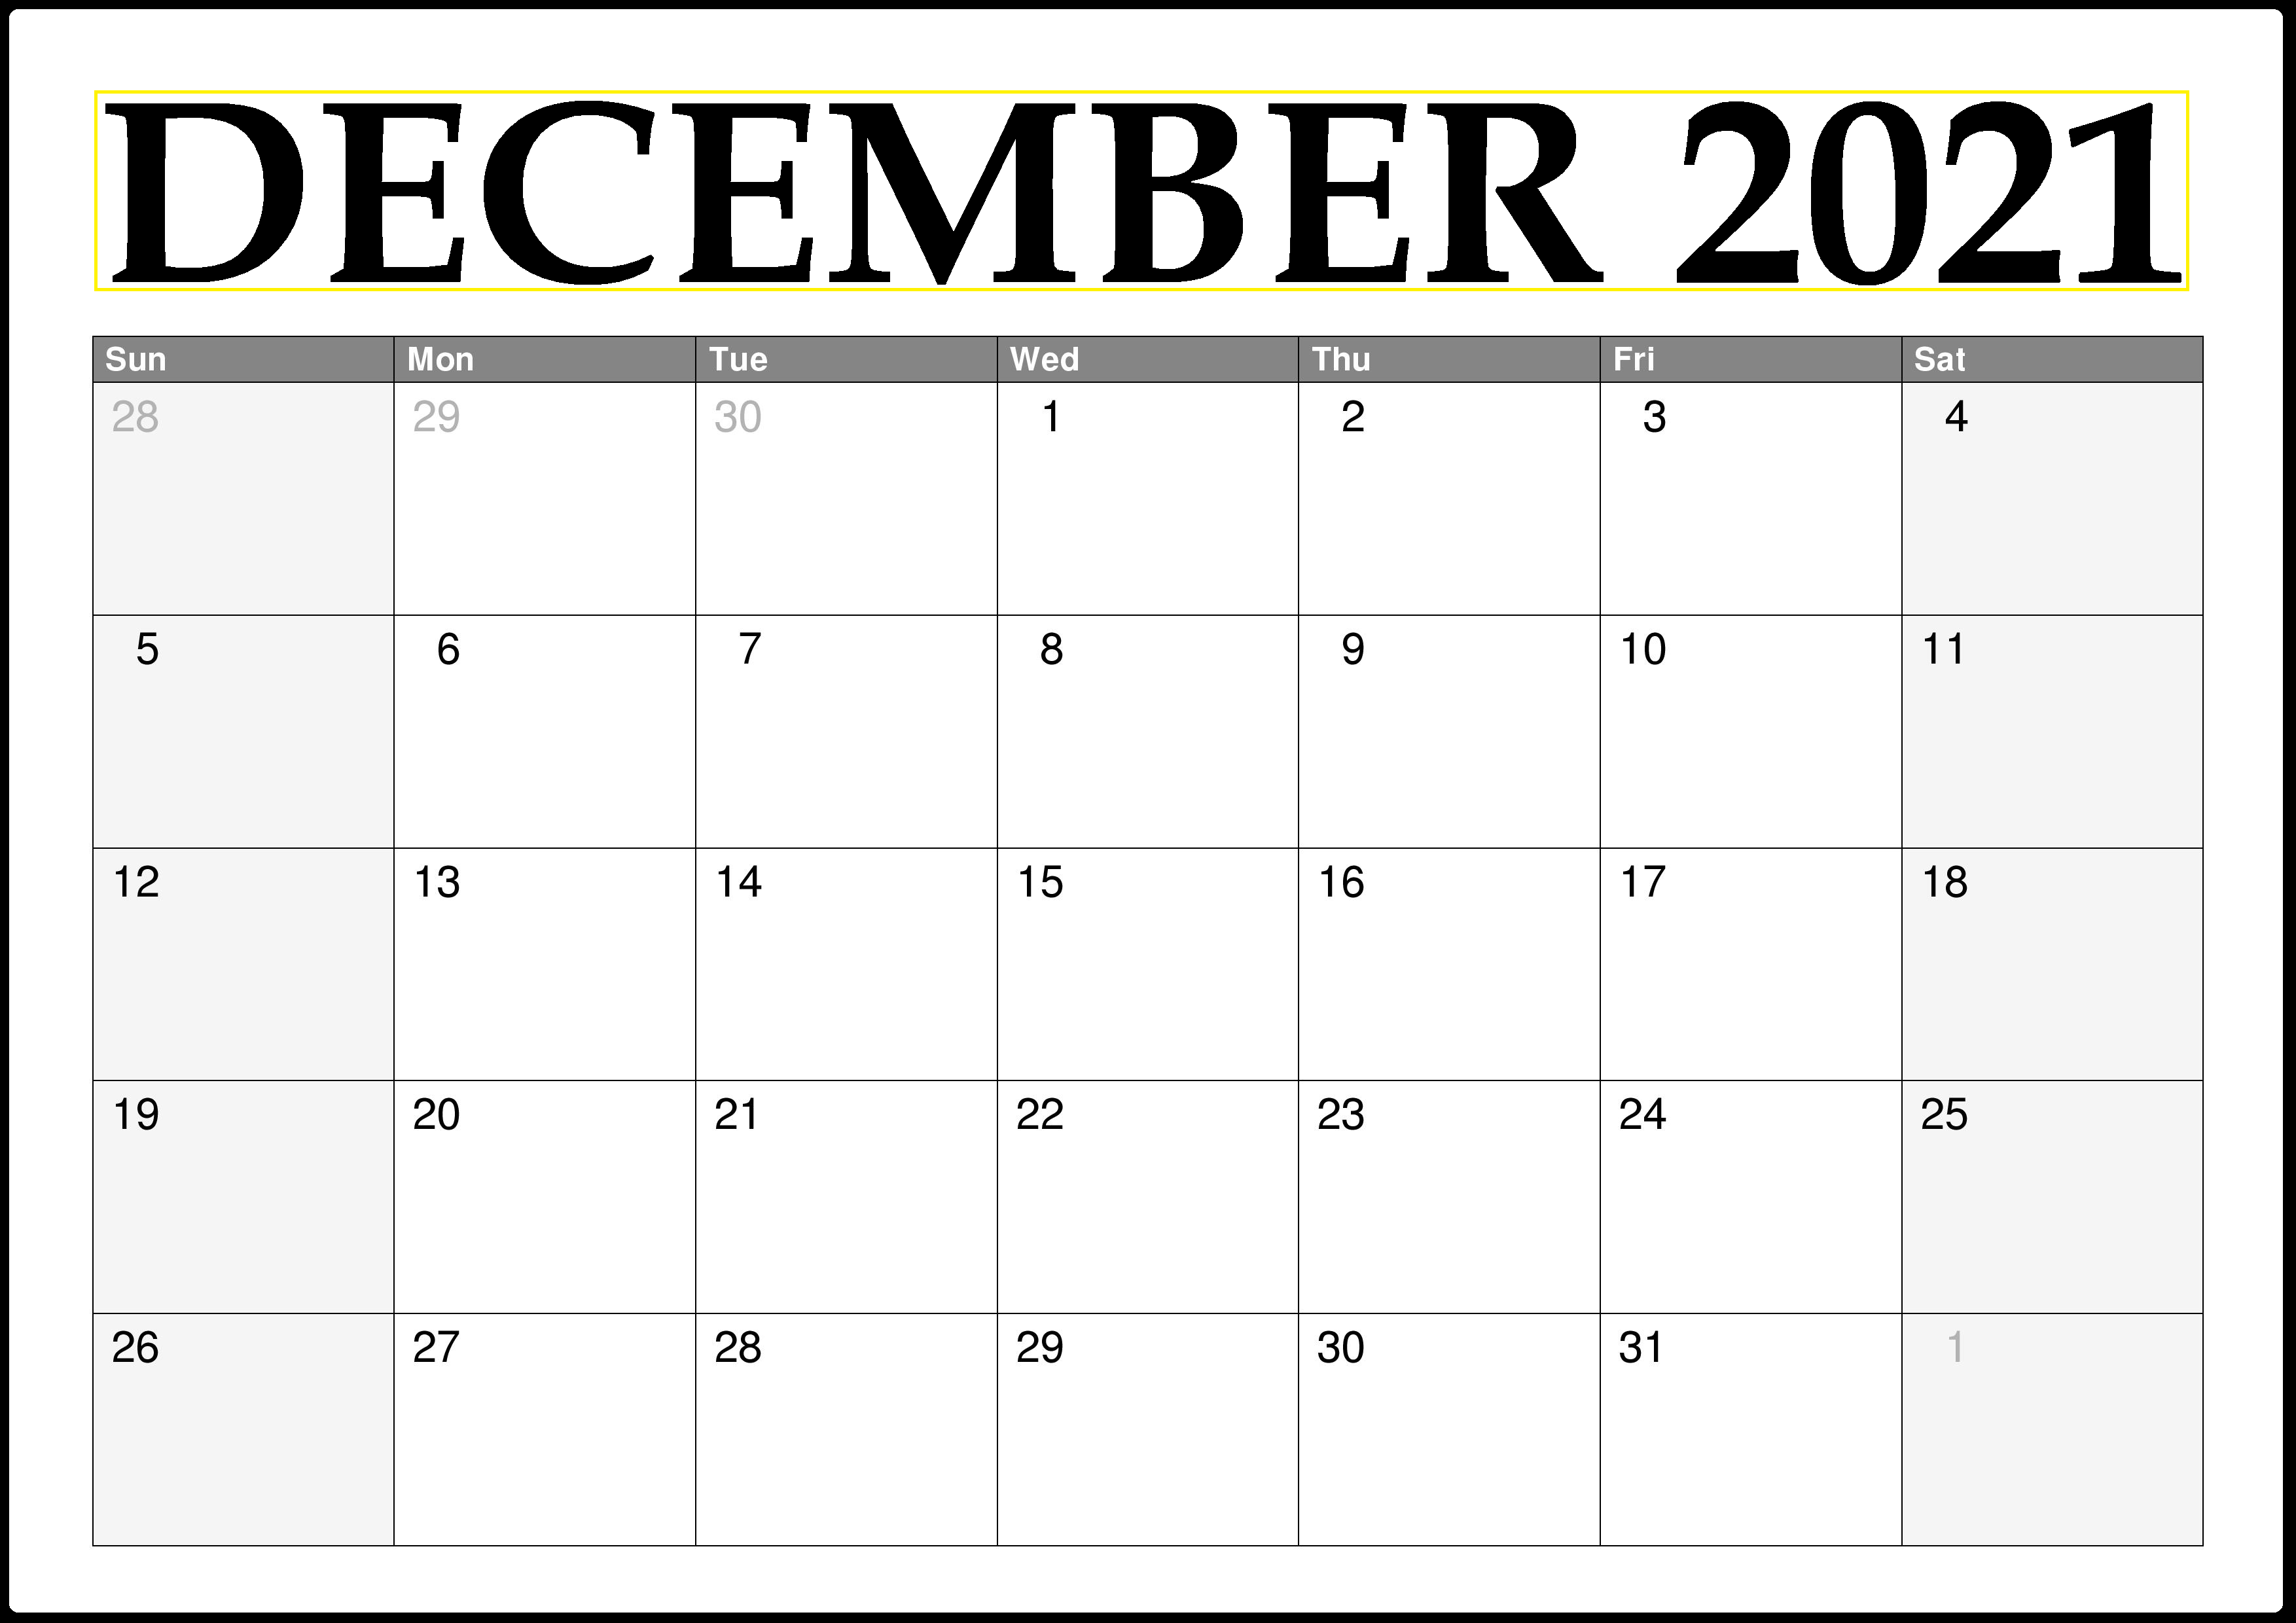 December 2021 Calendar Blank PNG